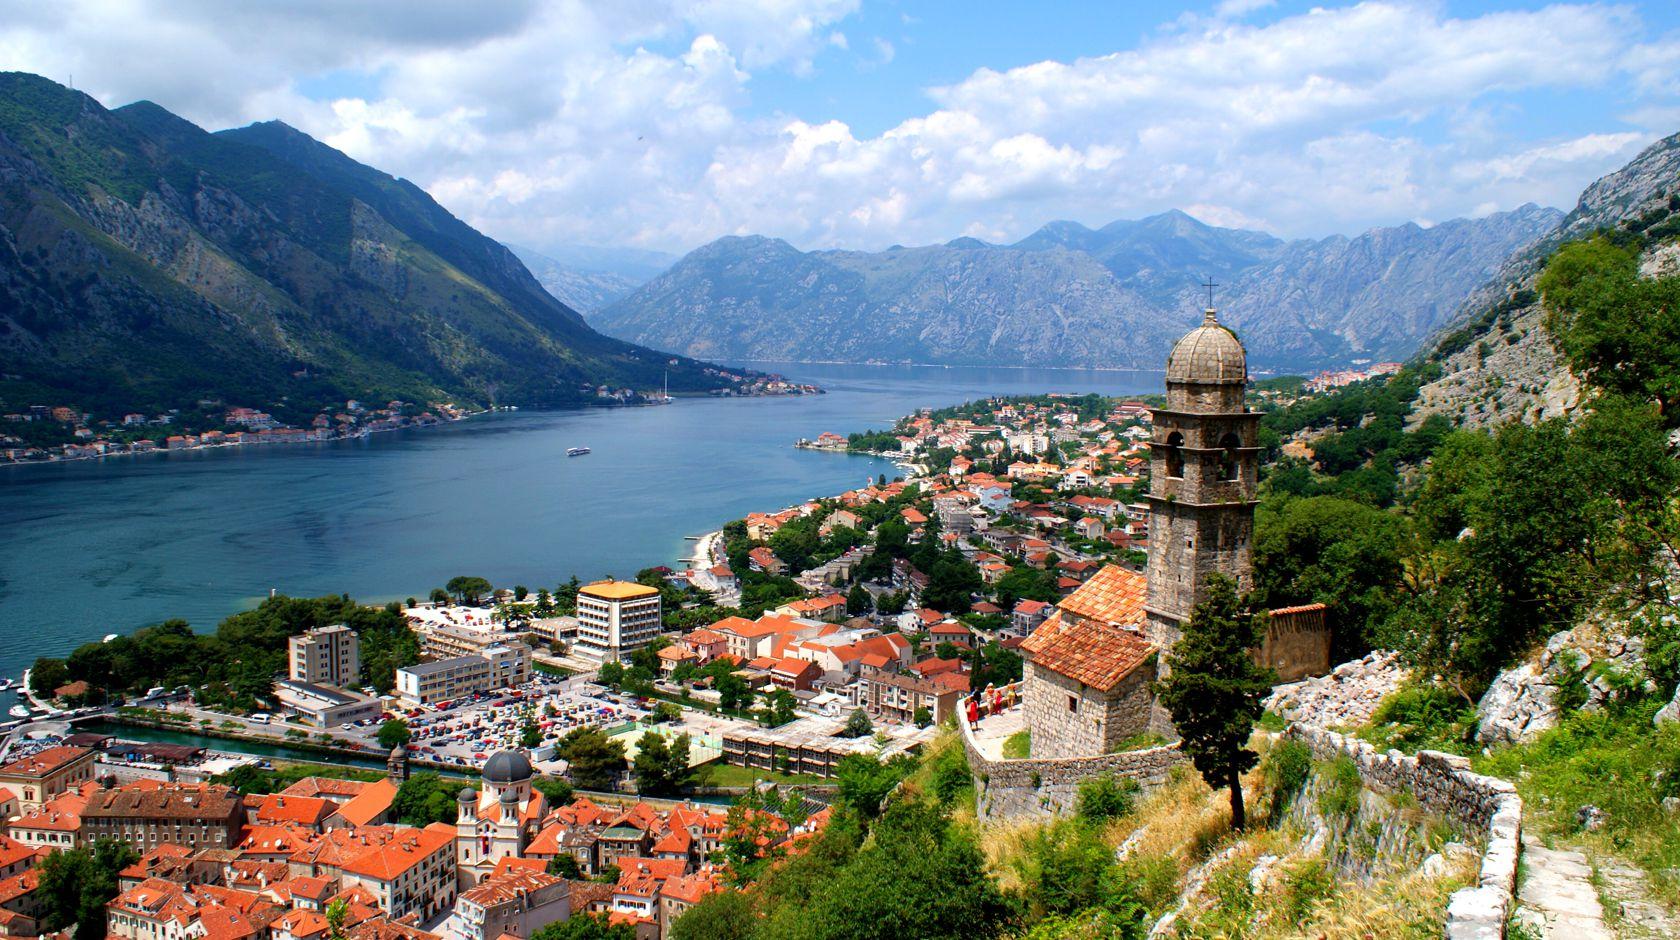 Montenegro top tourist destinations for 2015